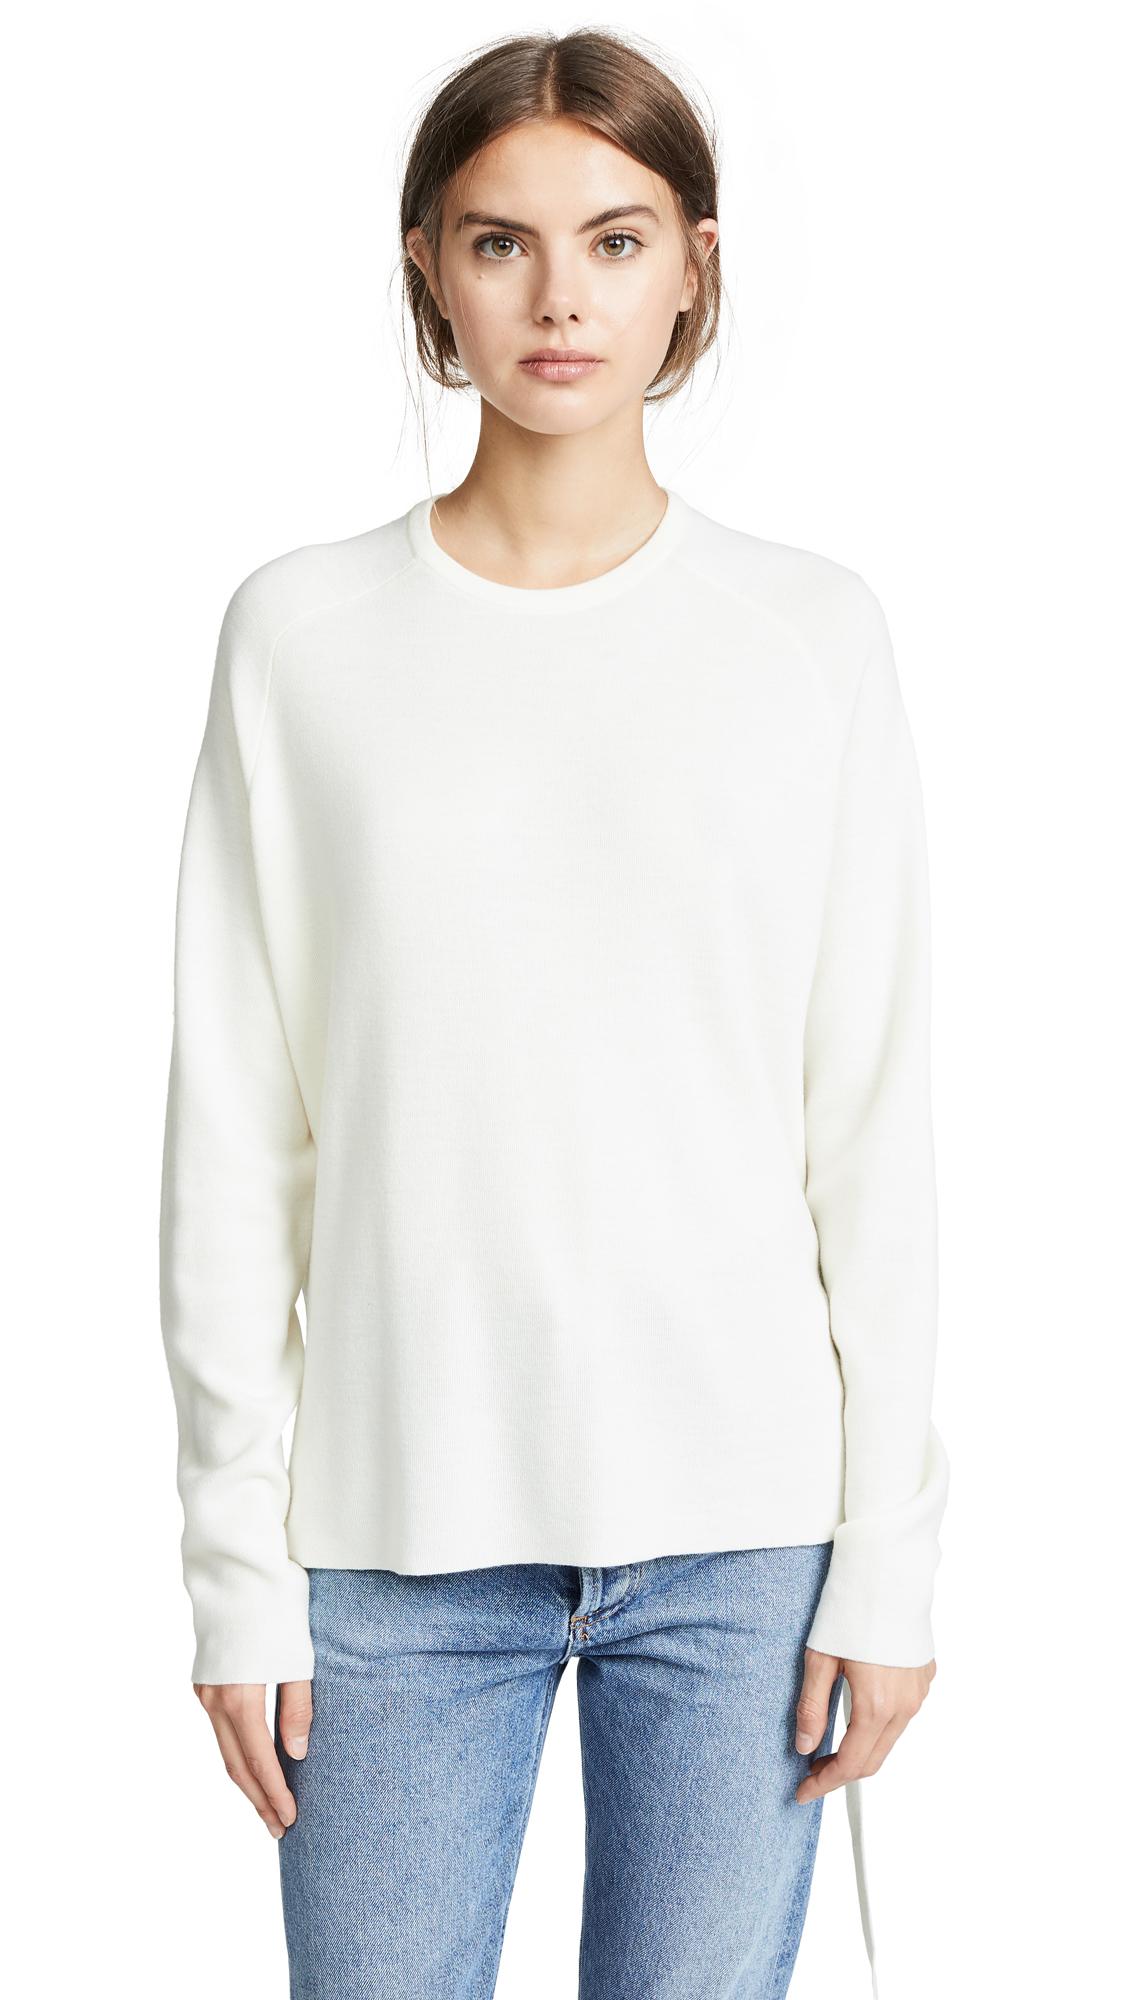 Tibi Poplin Back Pullover - Ivory/White Multi